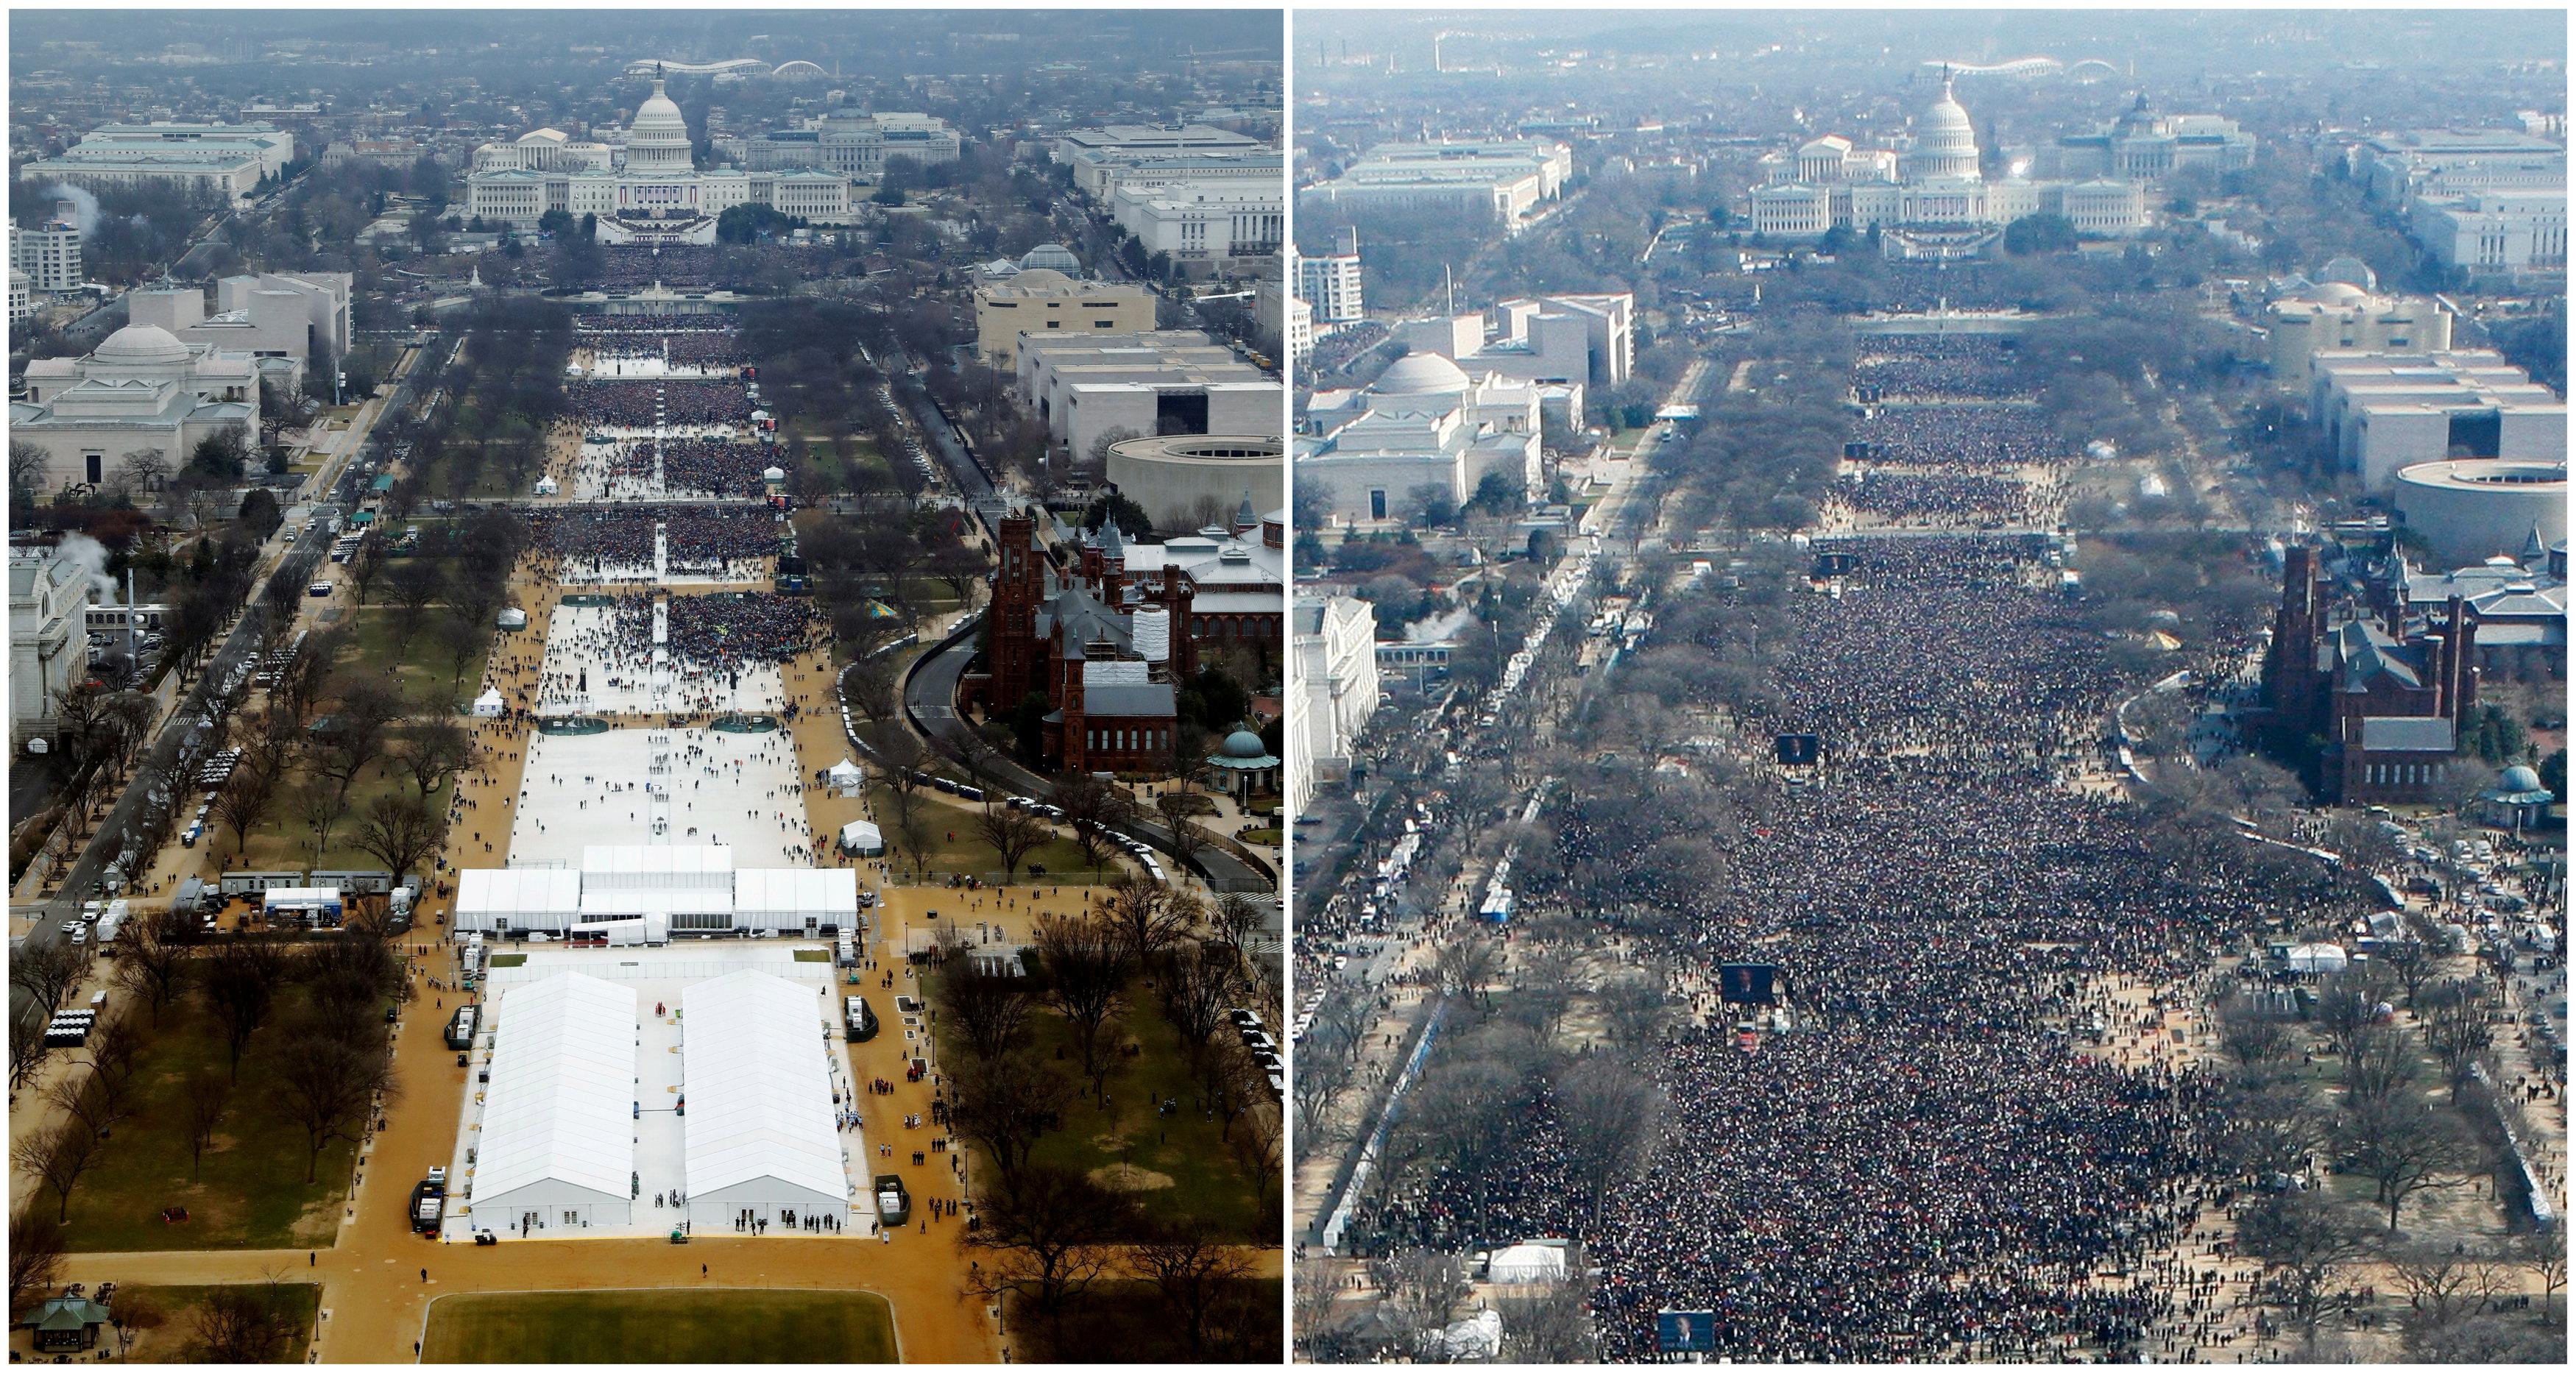 USA-TRUMP/INAUGURATION-IMAGE